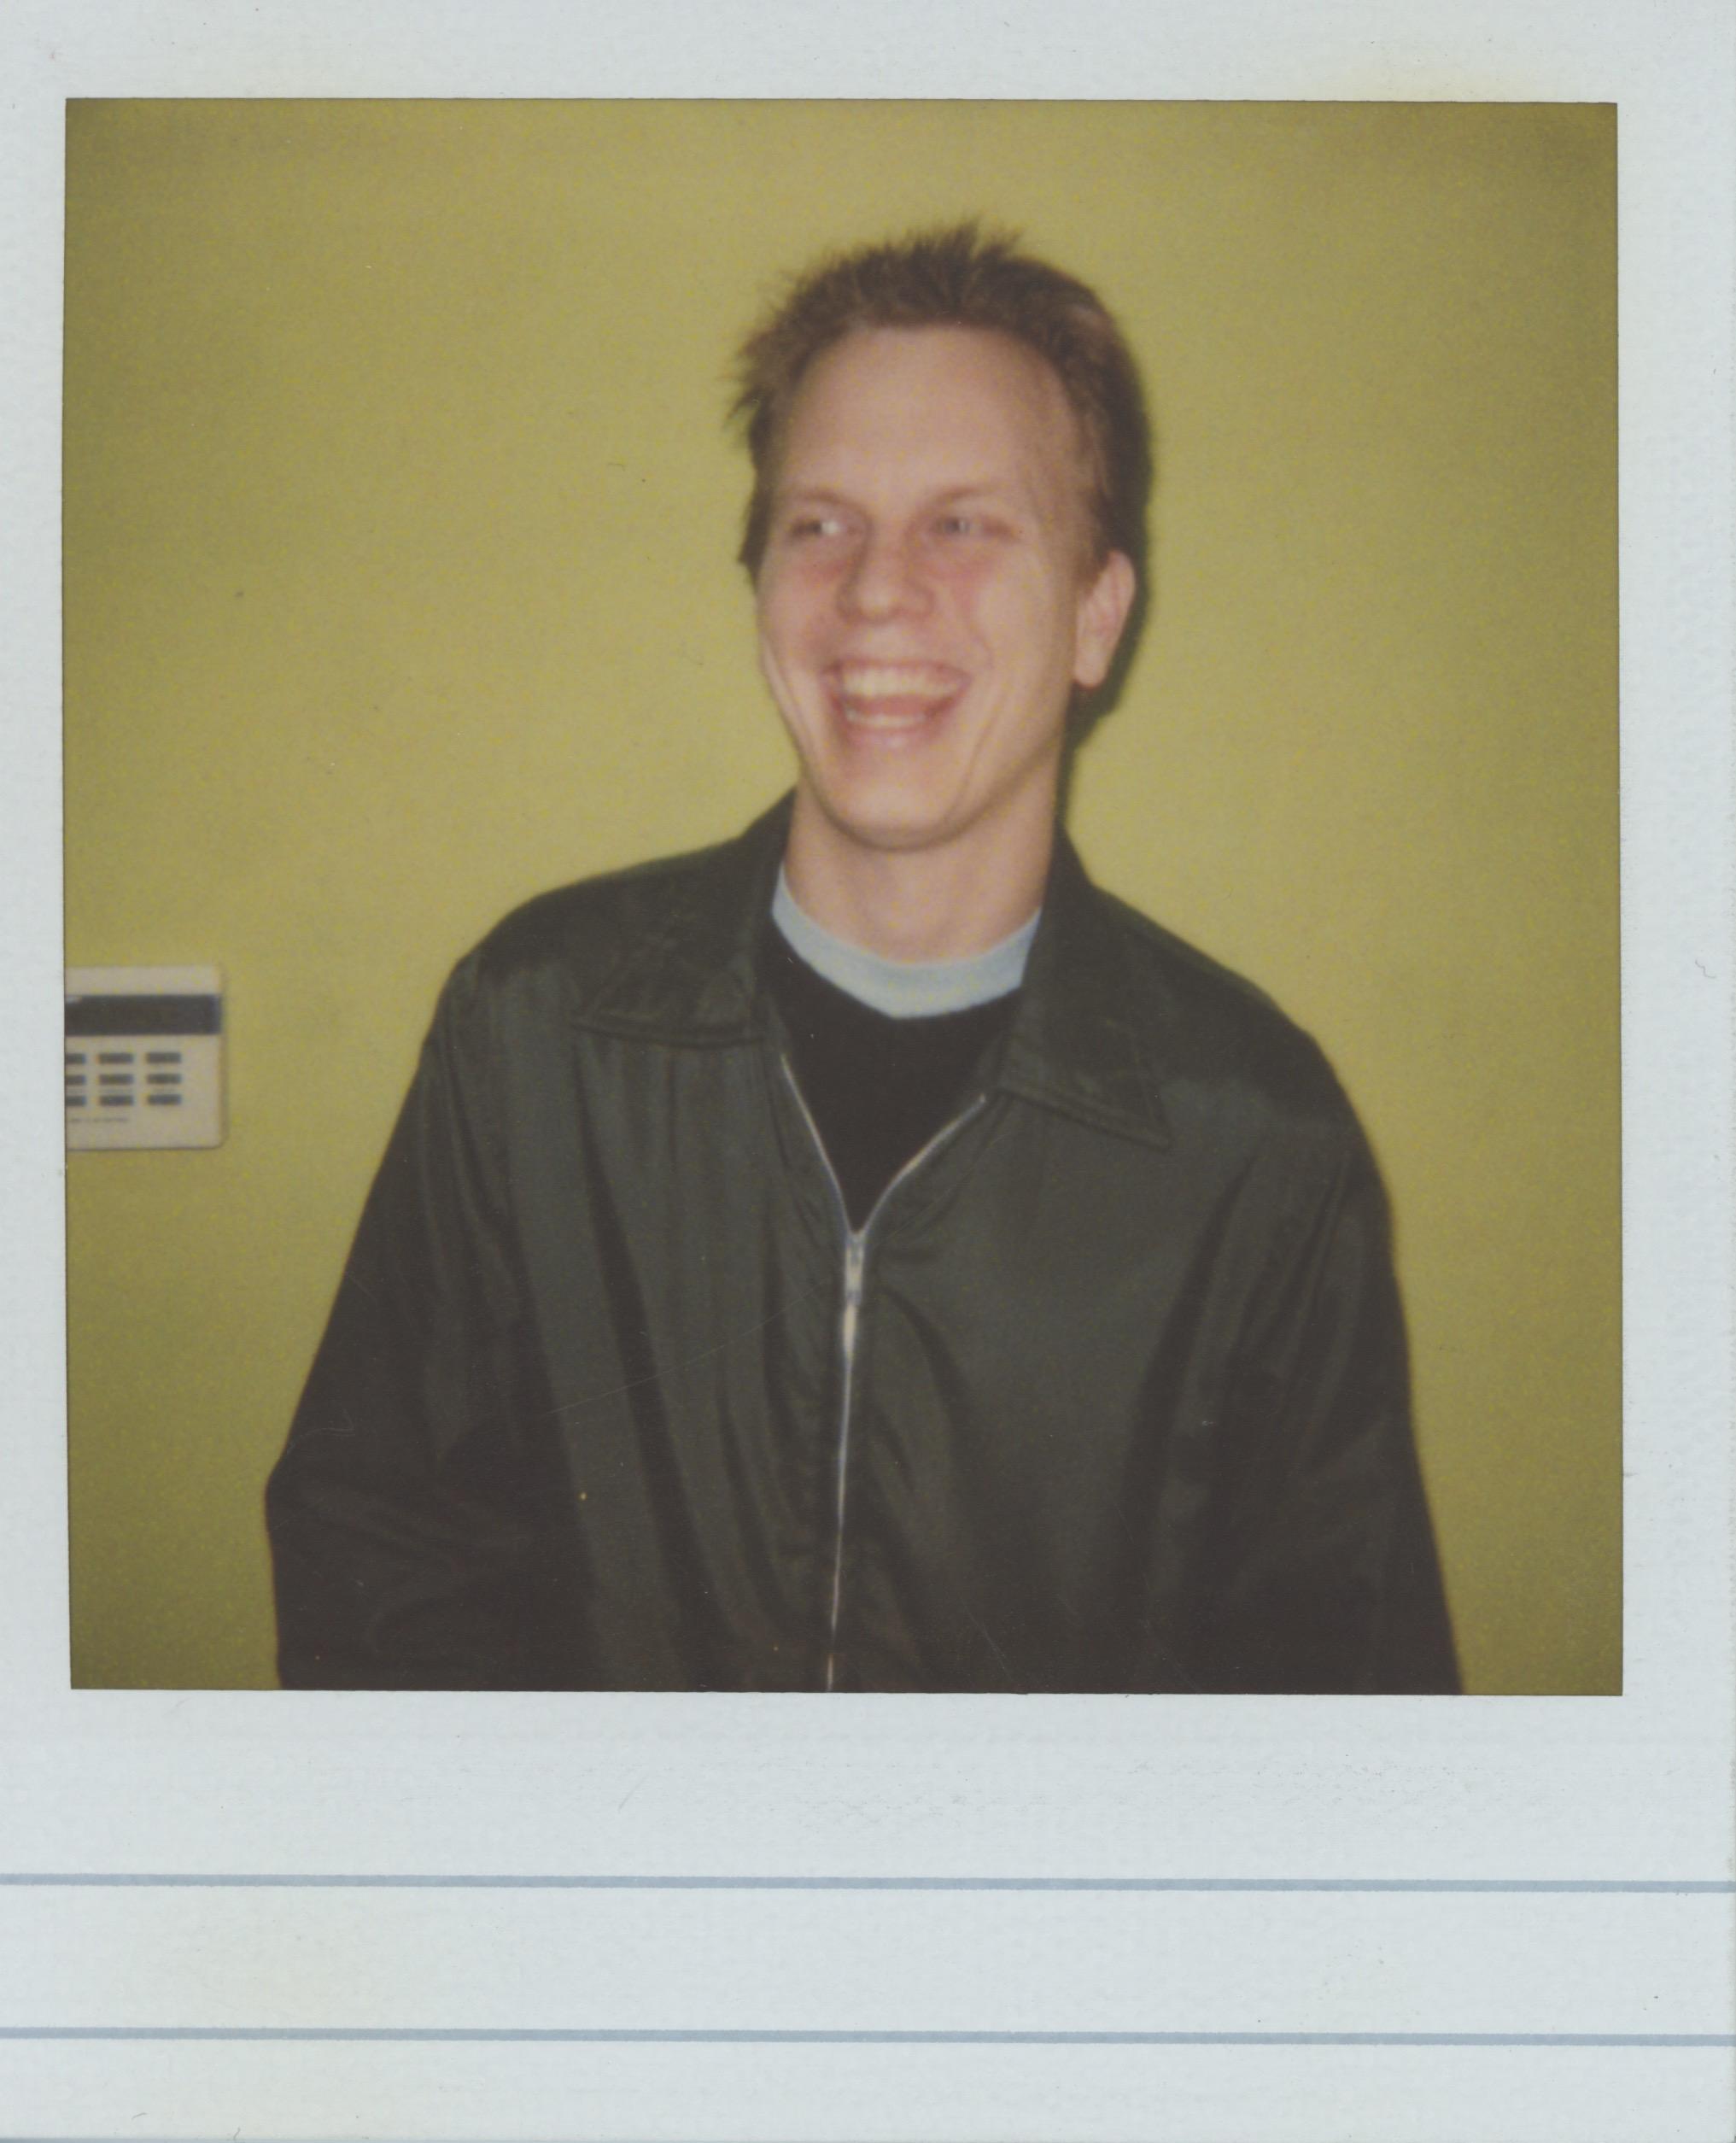 Todd Ransick